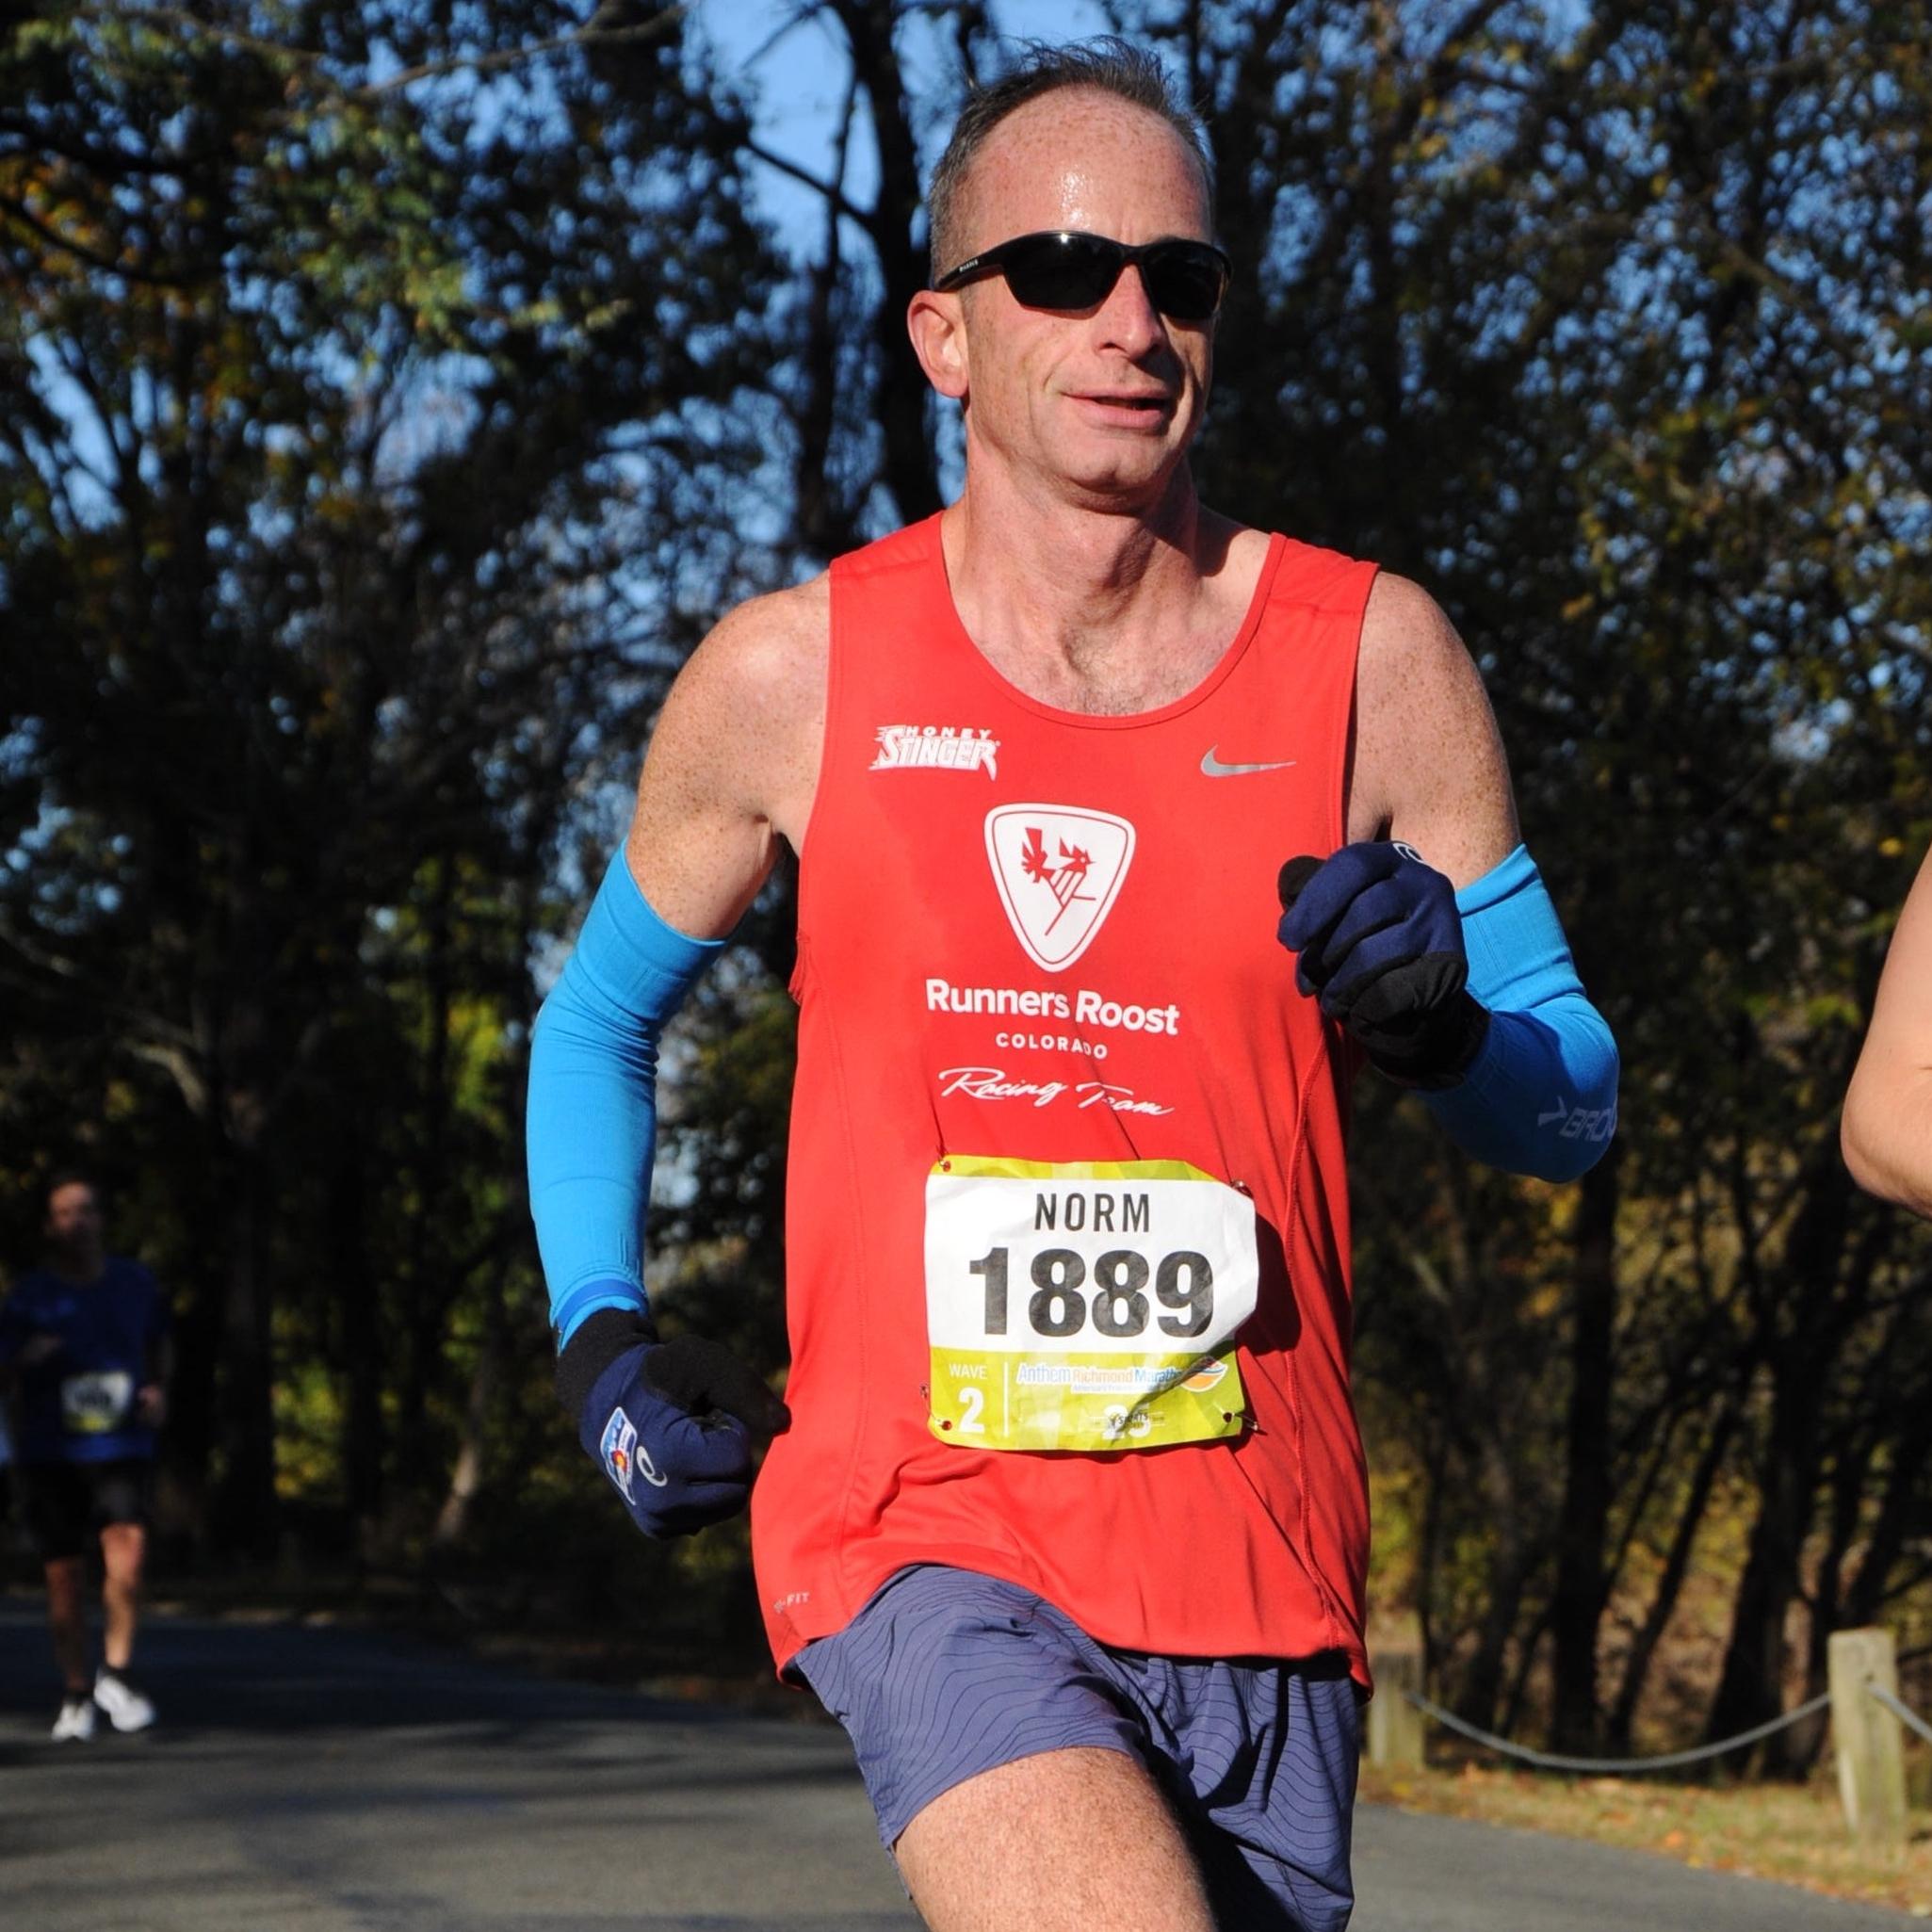 Norm Kendrick 5k-Marathon @NormKendrick